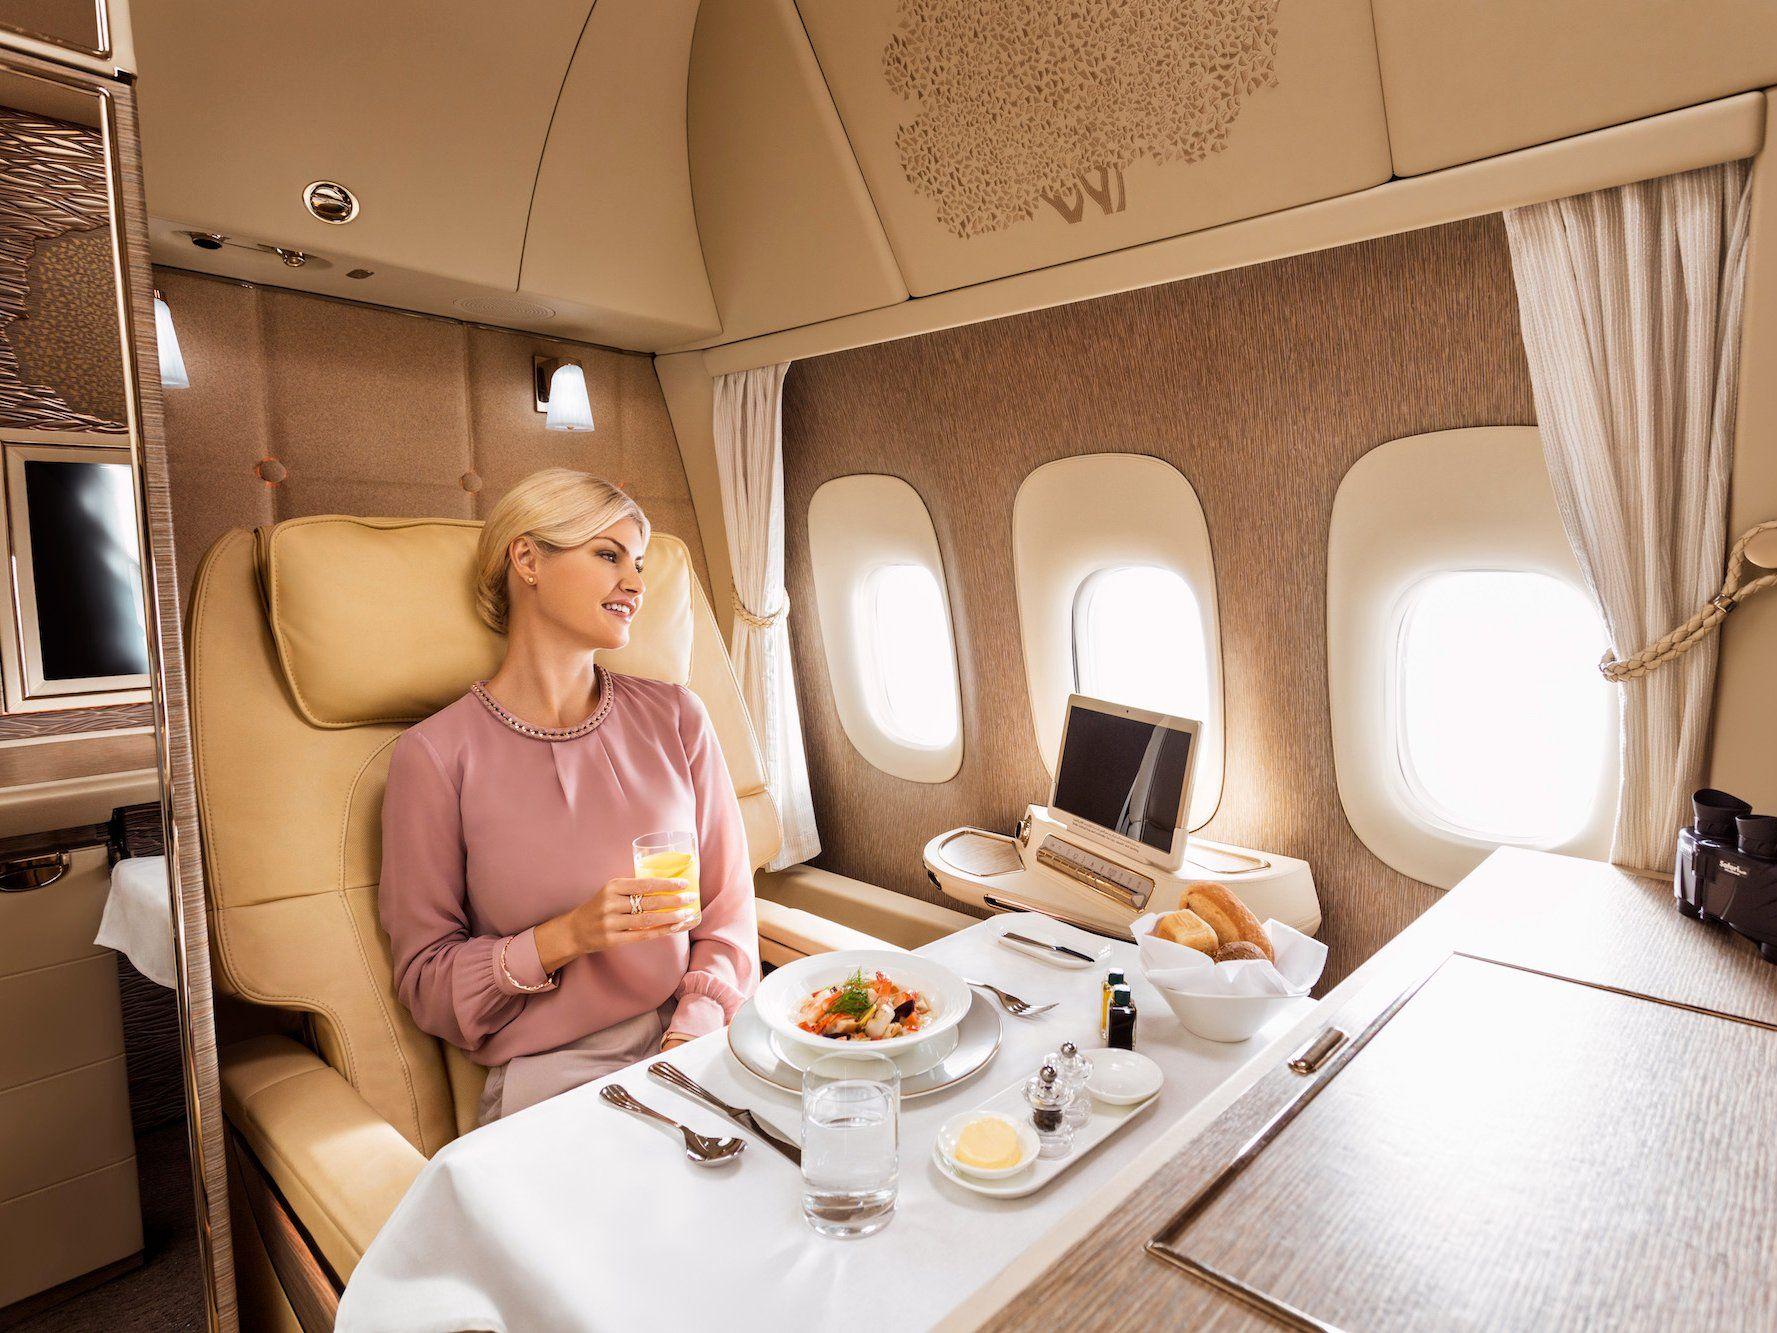 Emirates New Mercedes Benz First Class Luxury Suites Photos